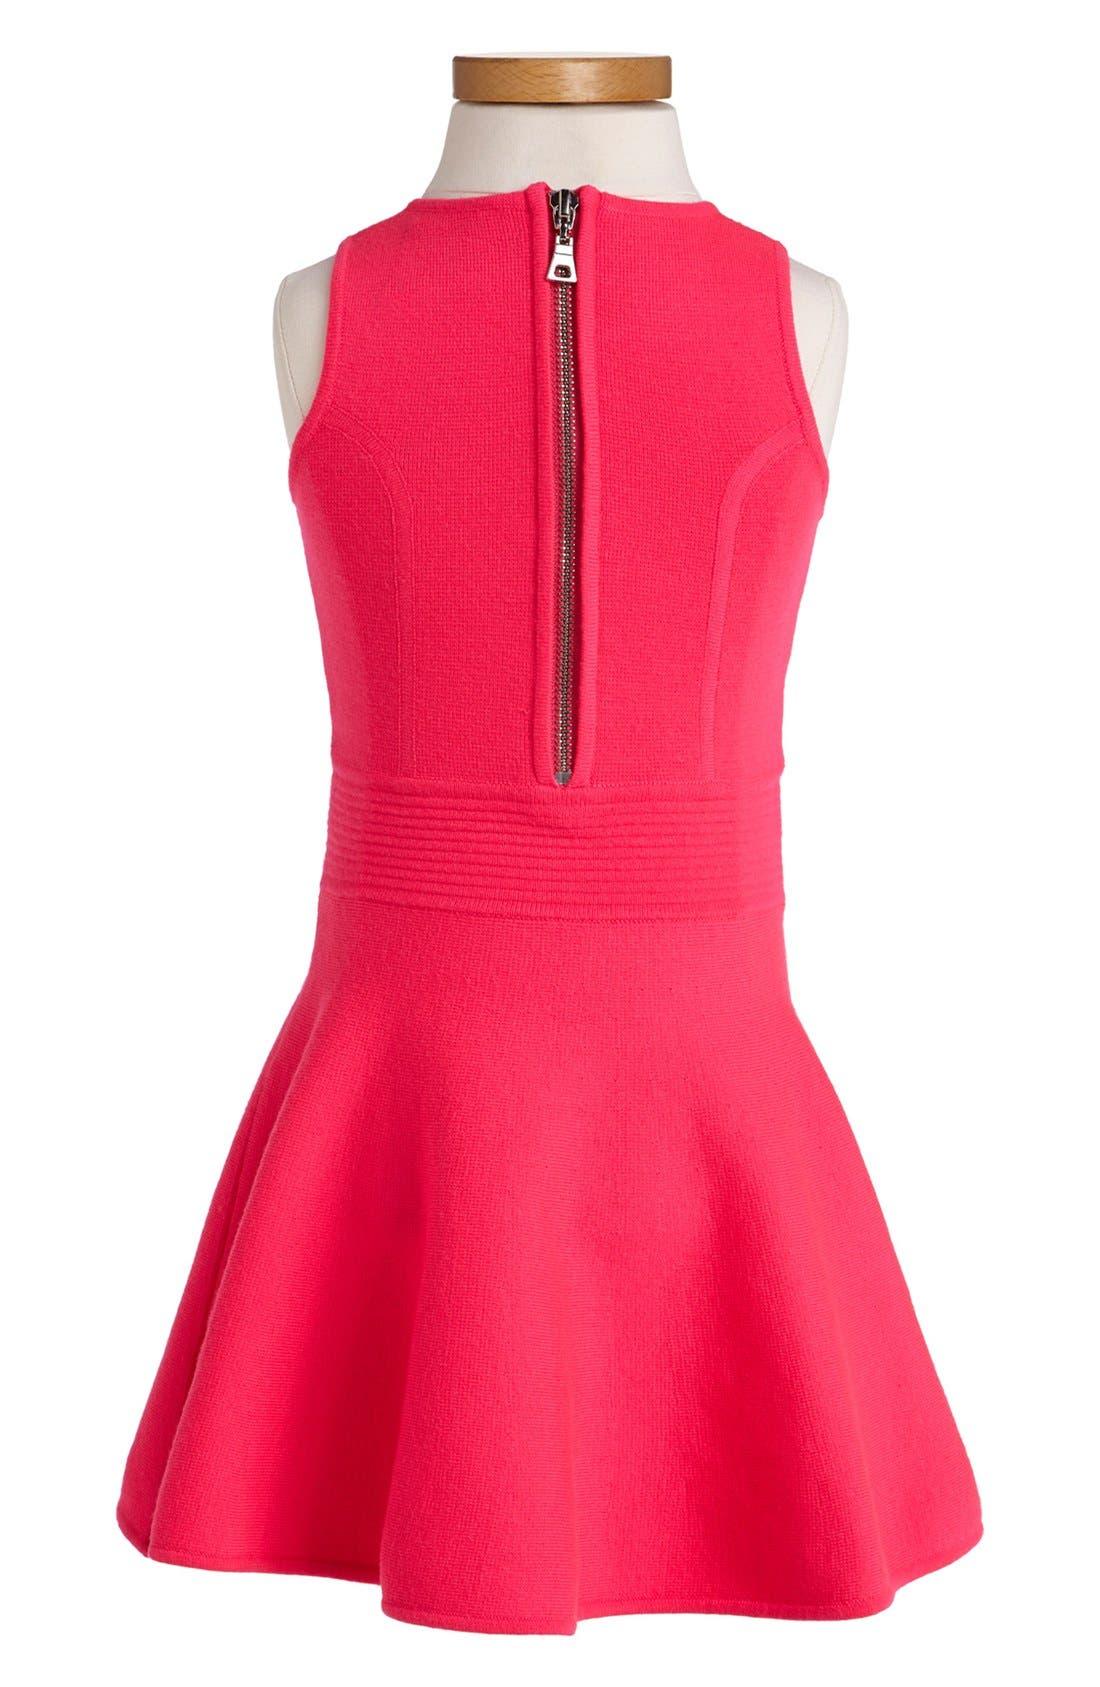 Alternate Image 2  - Milly Minis Pleated Flare Dress (Toddler Girls, Little Girls & Big Girls)